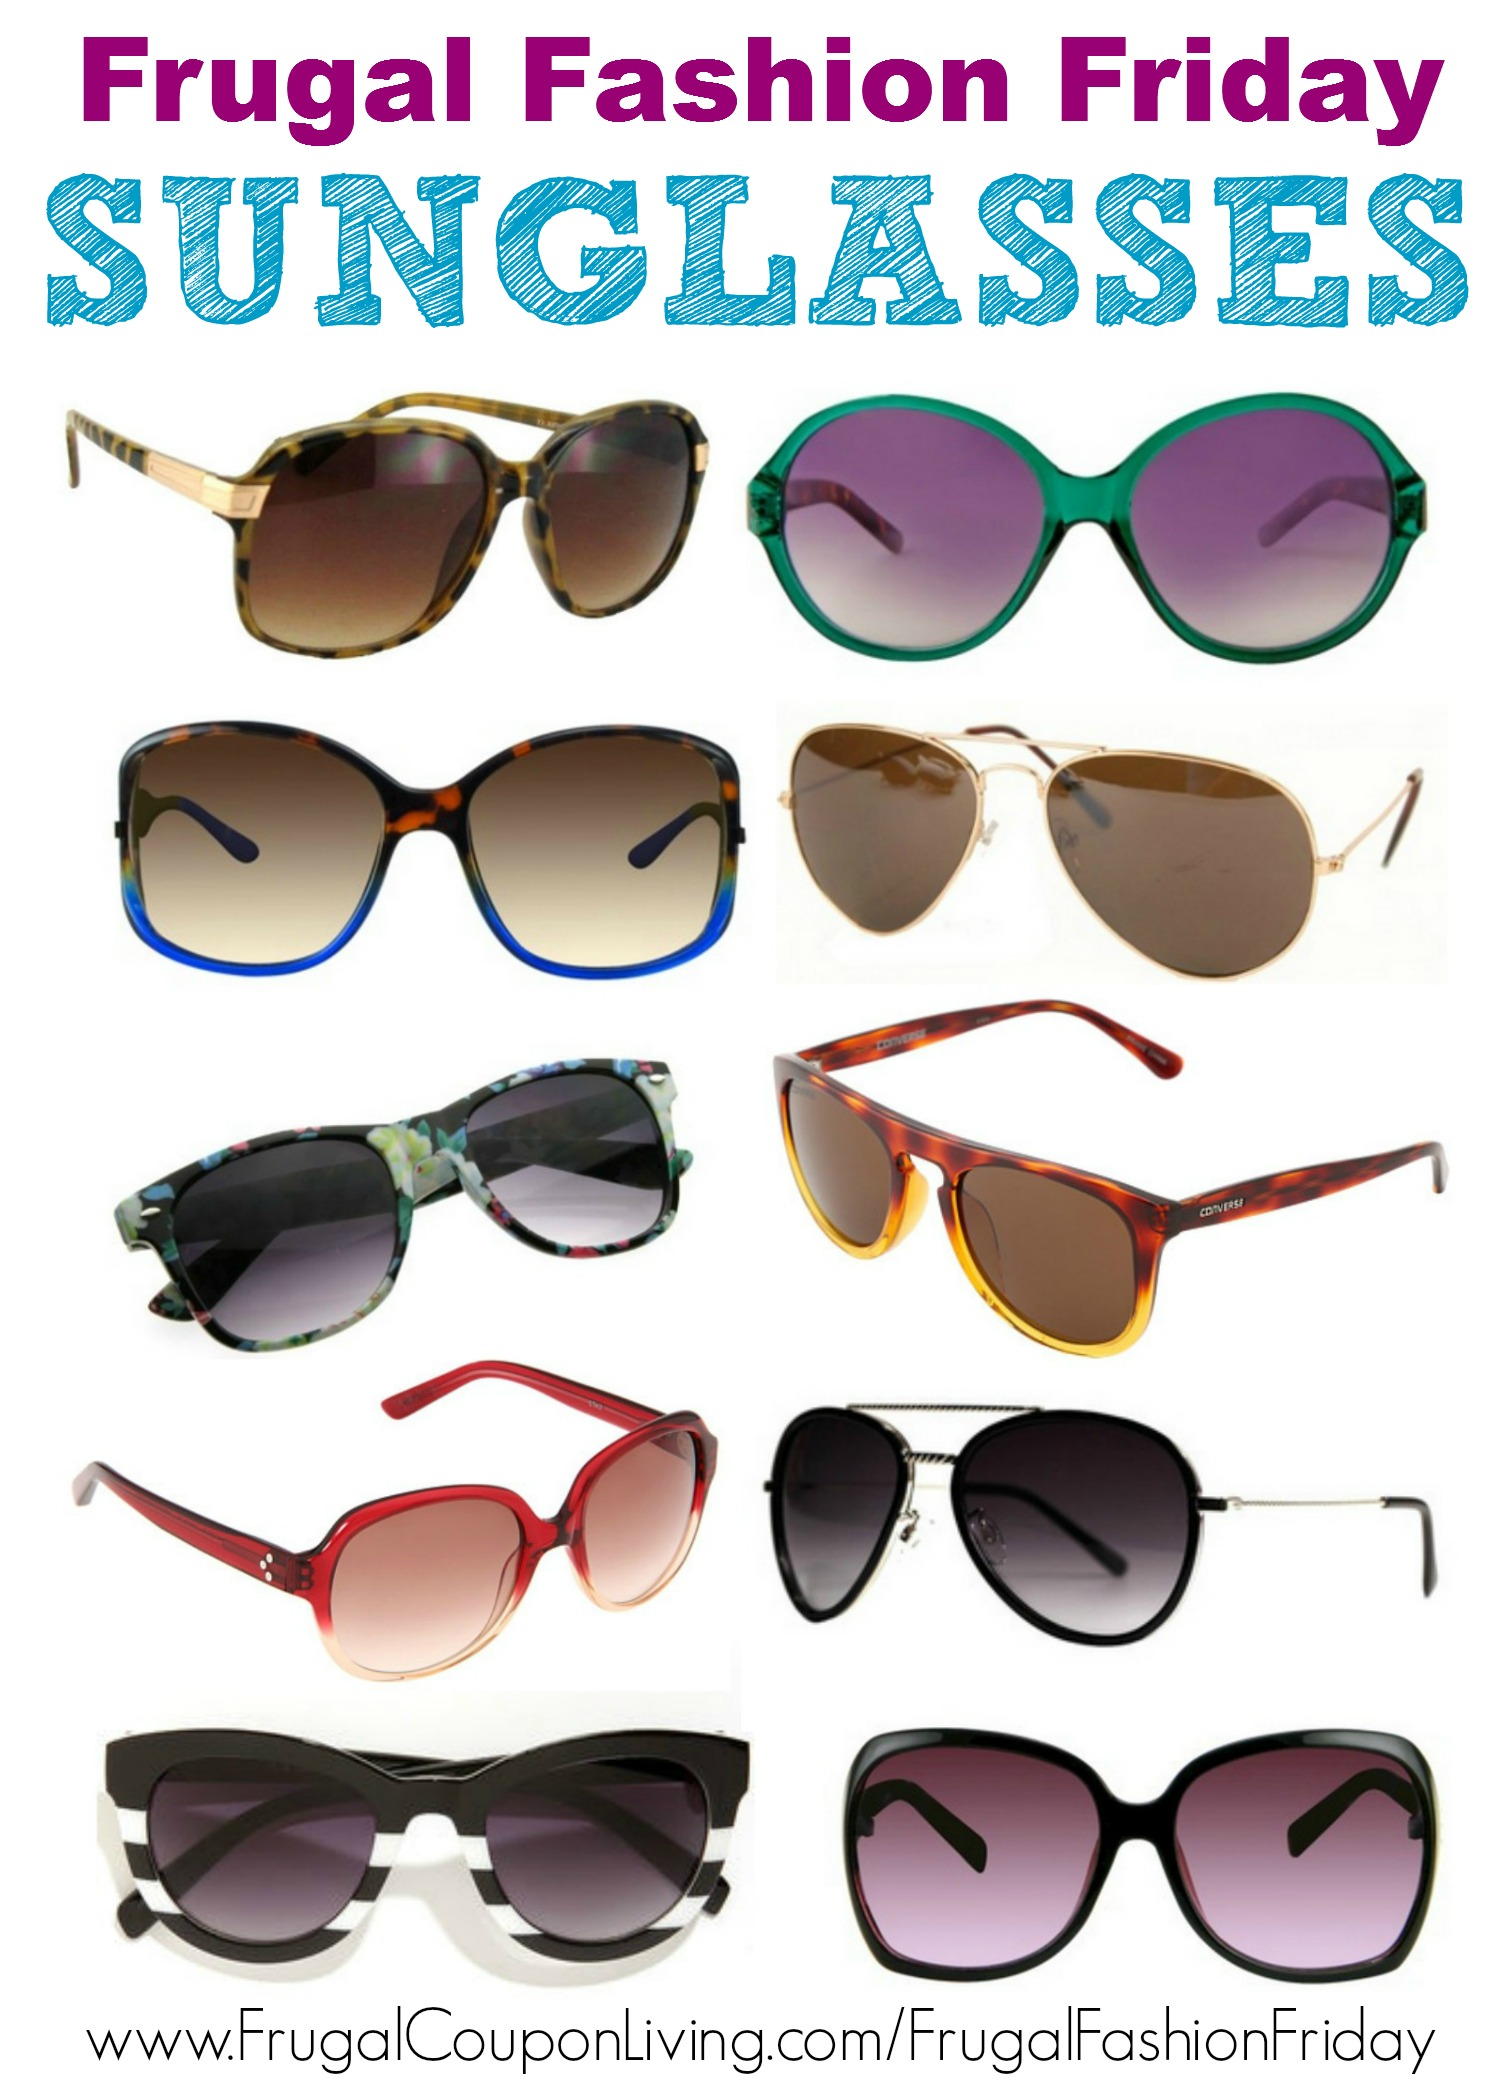 frugal-fashion-friday-sunglasses-round-up